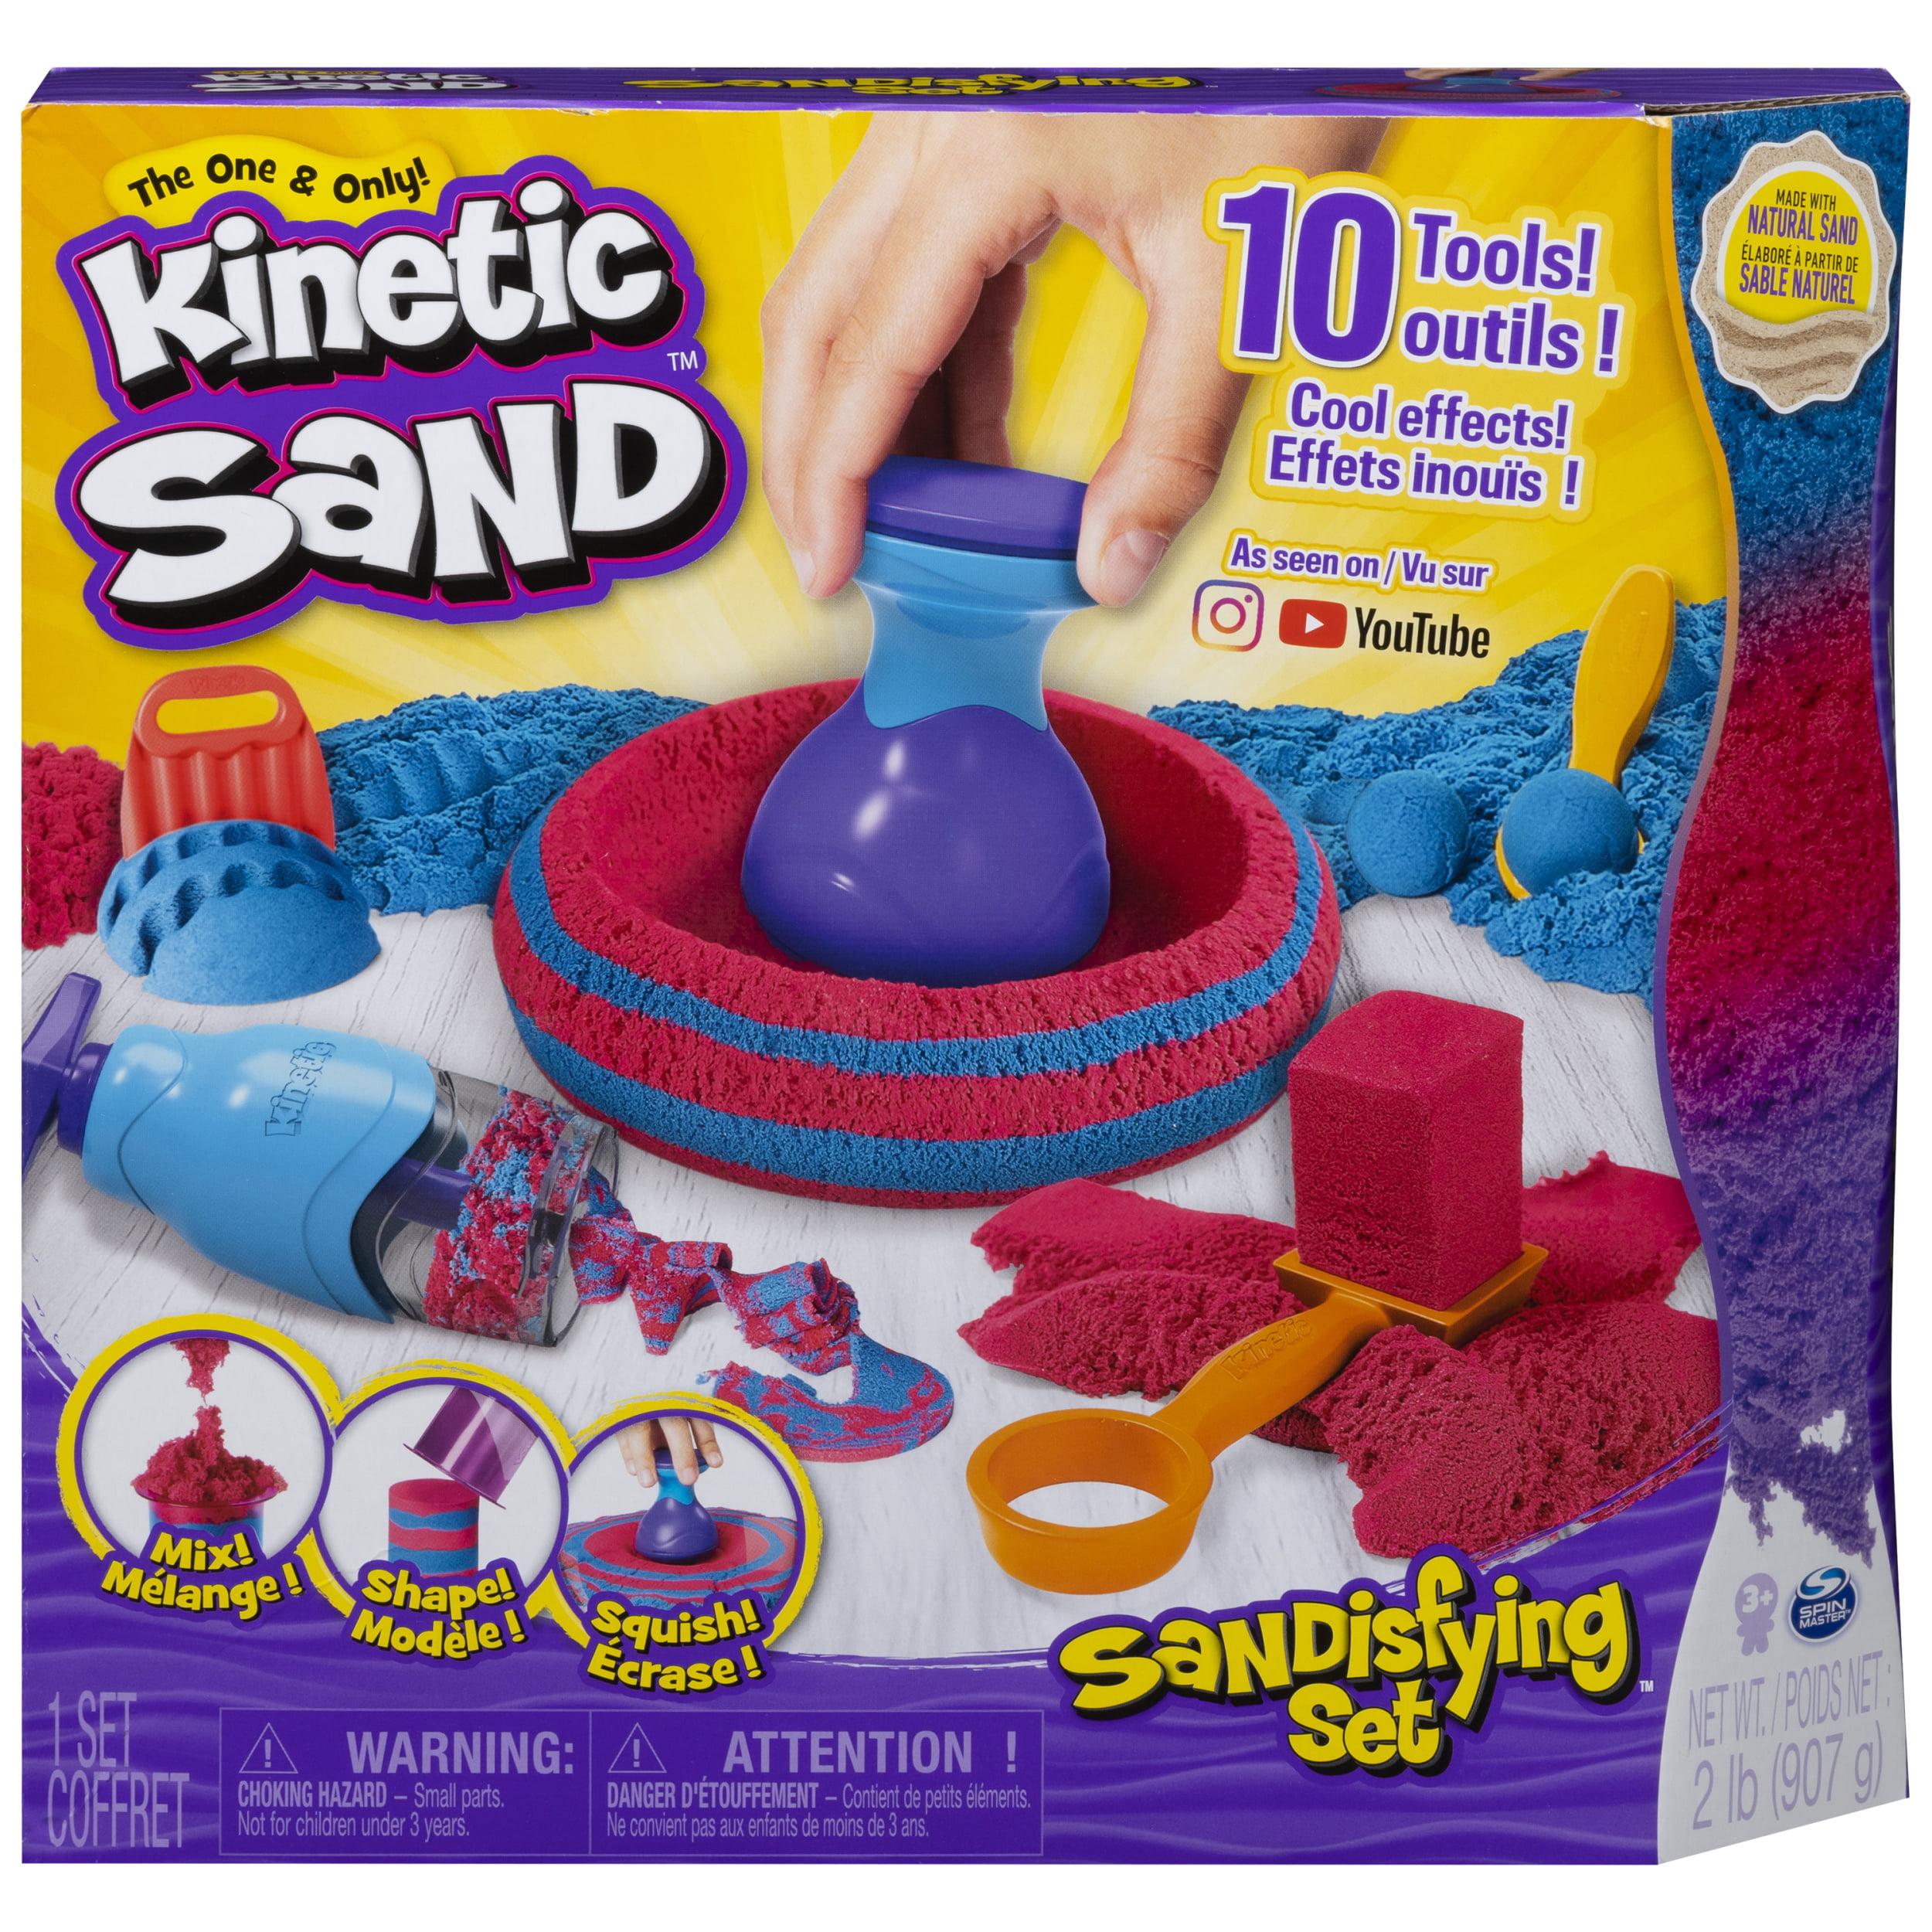 Sand Art Bottle Kids Girls Craft DIY Hobby Party Activity Toy Game Kit Set